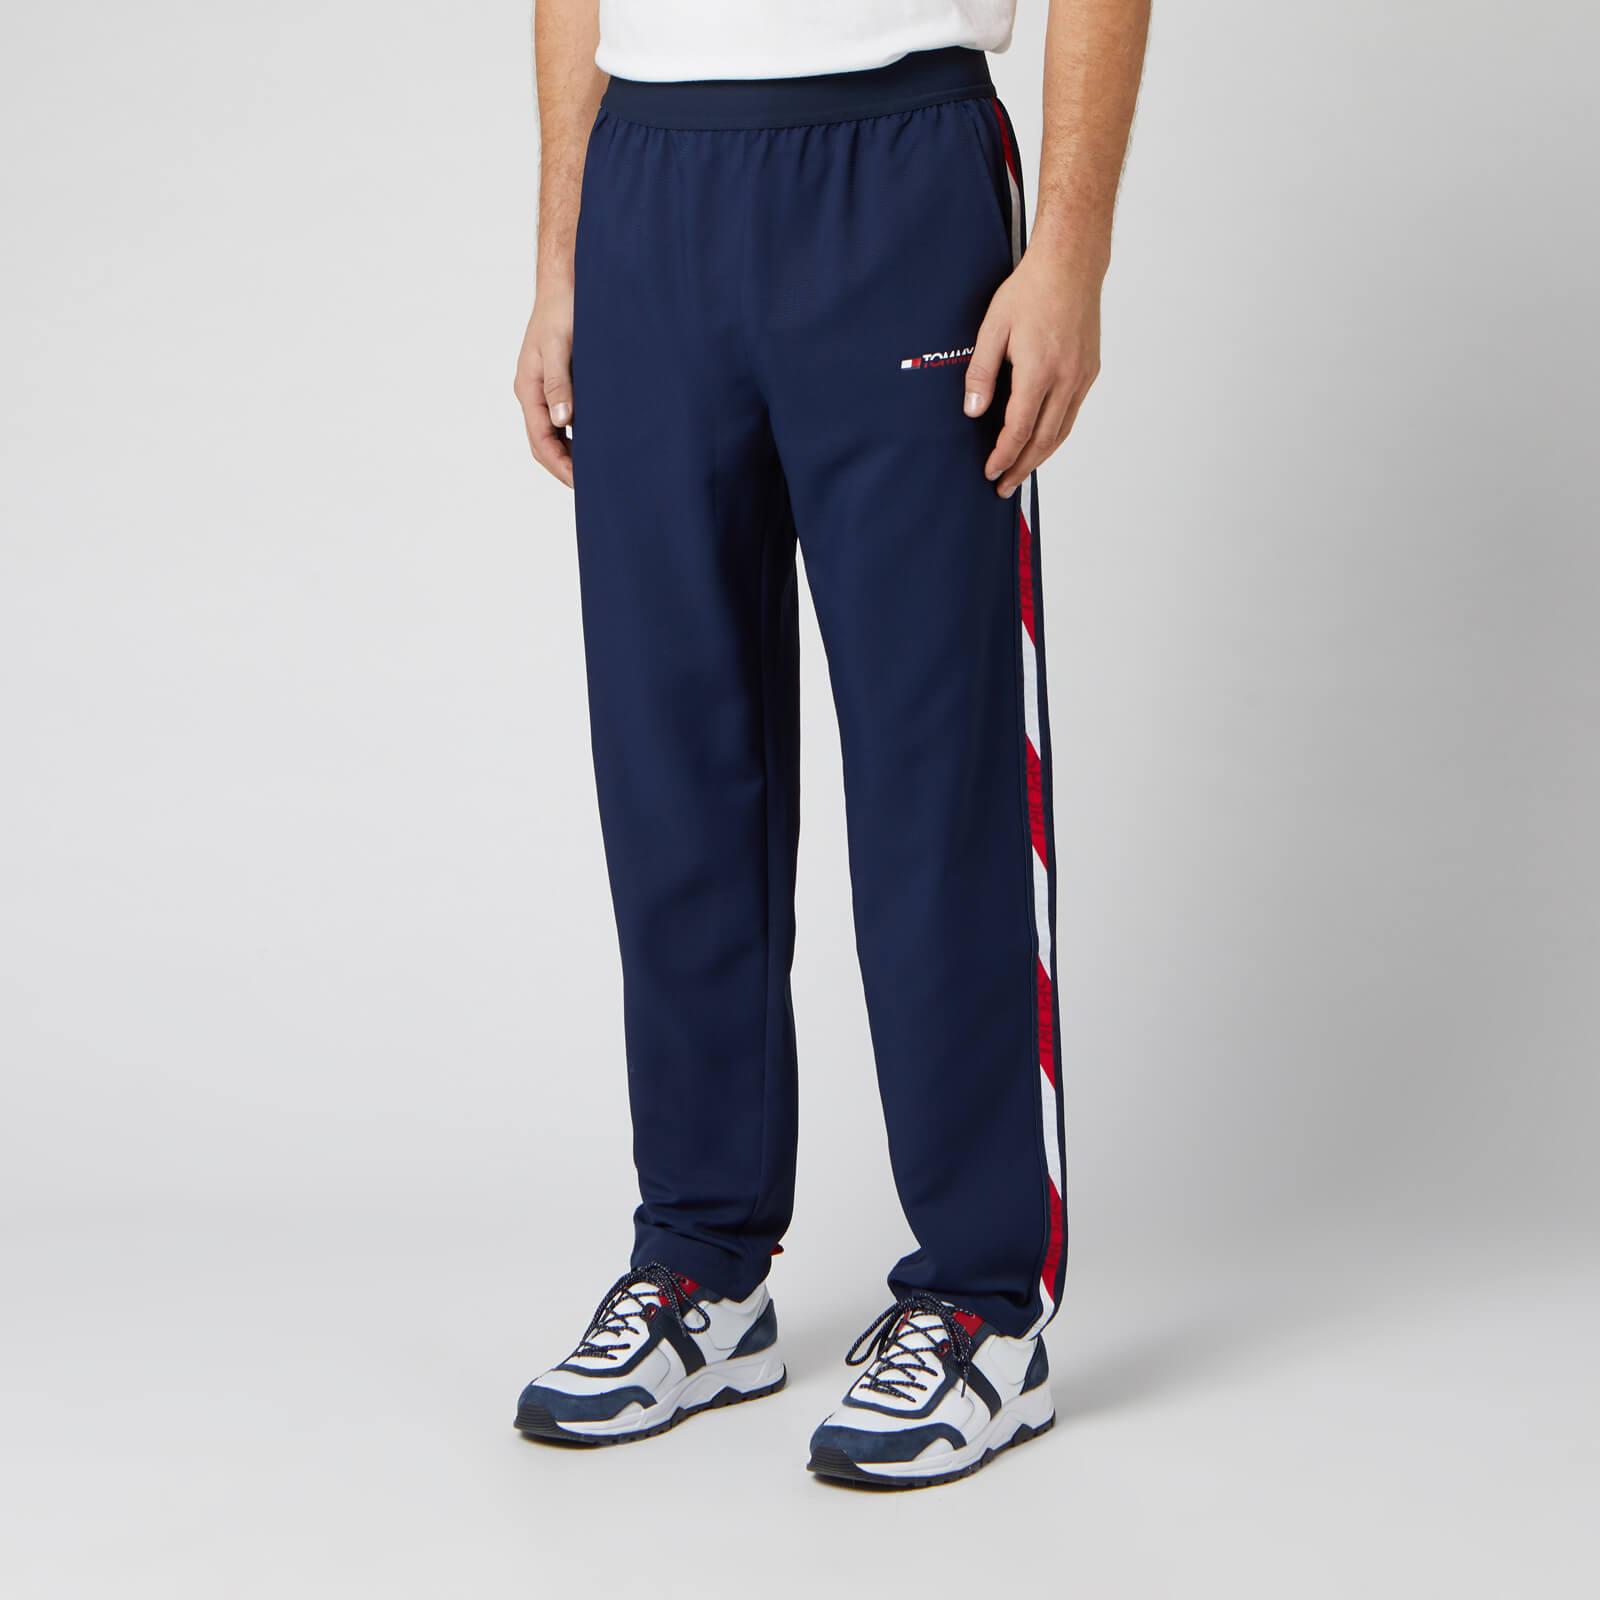 Tommy Hilfiger Sport Men's Woven Tape Pants - Sport Navy - L